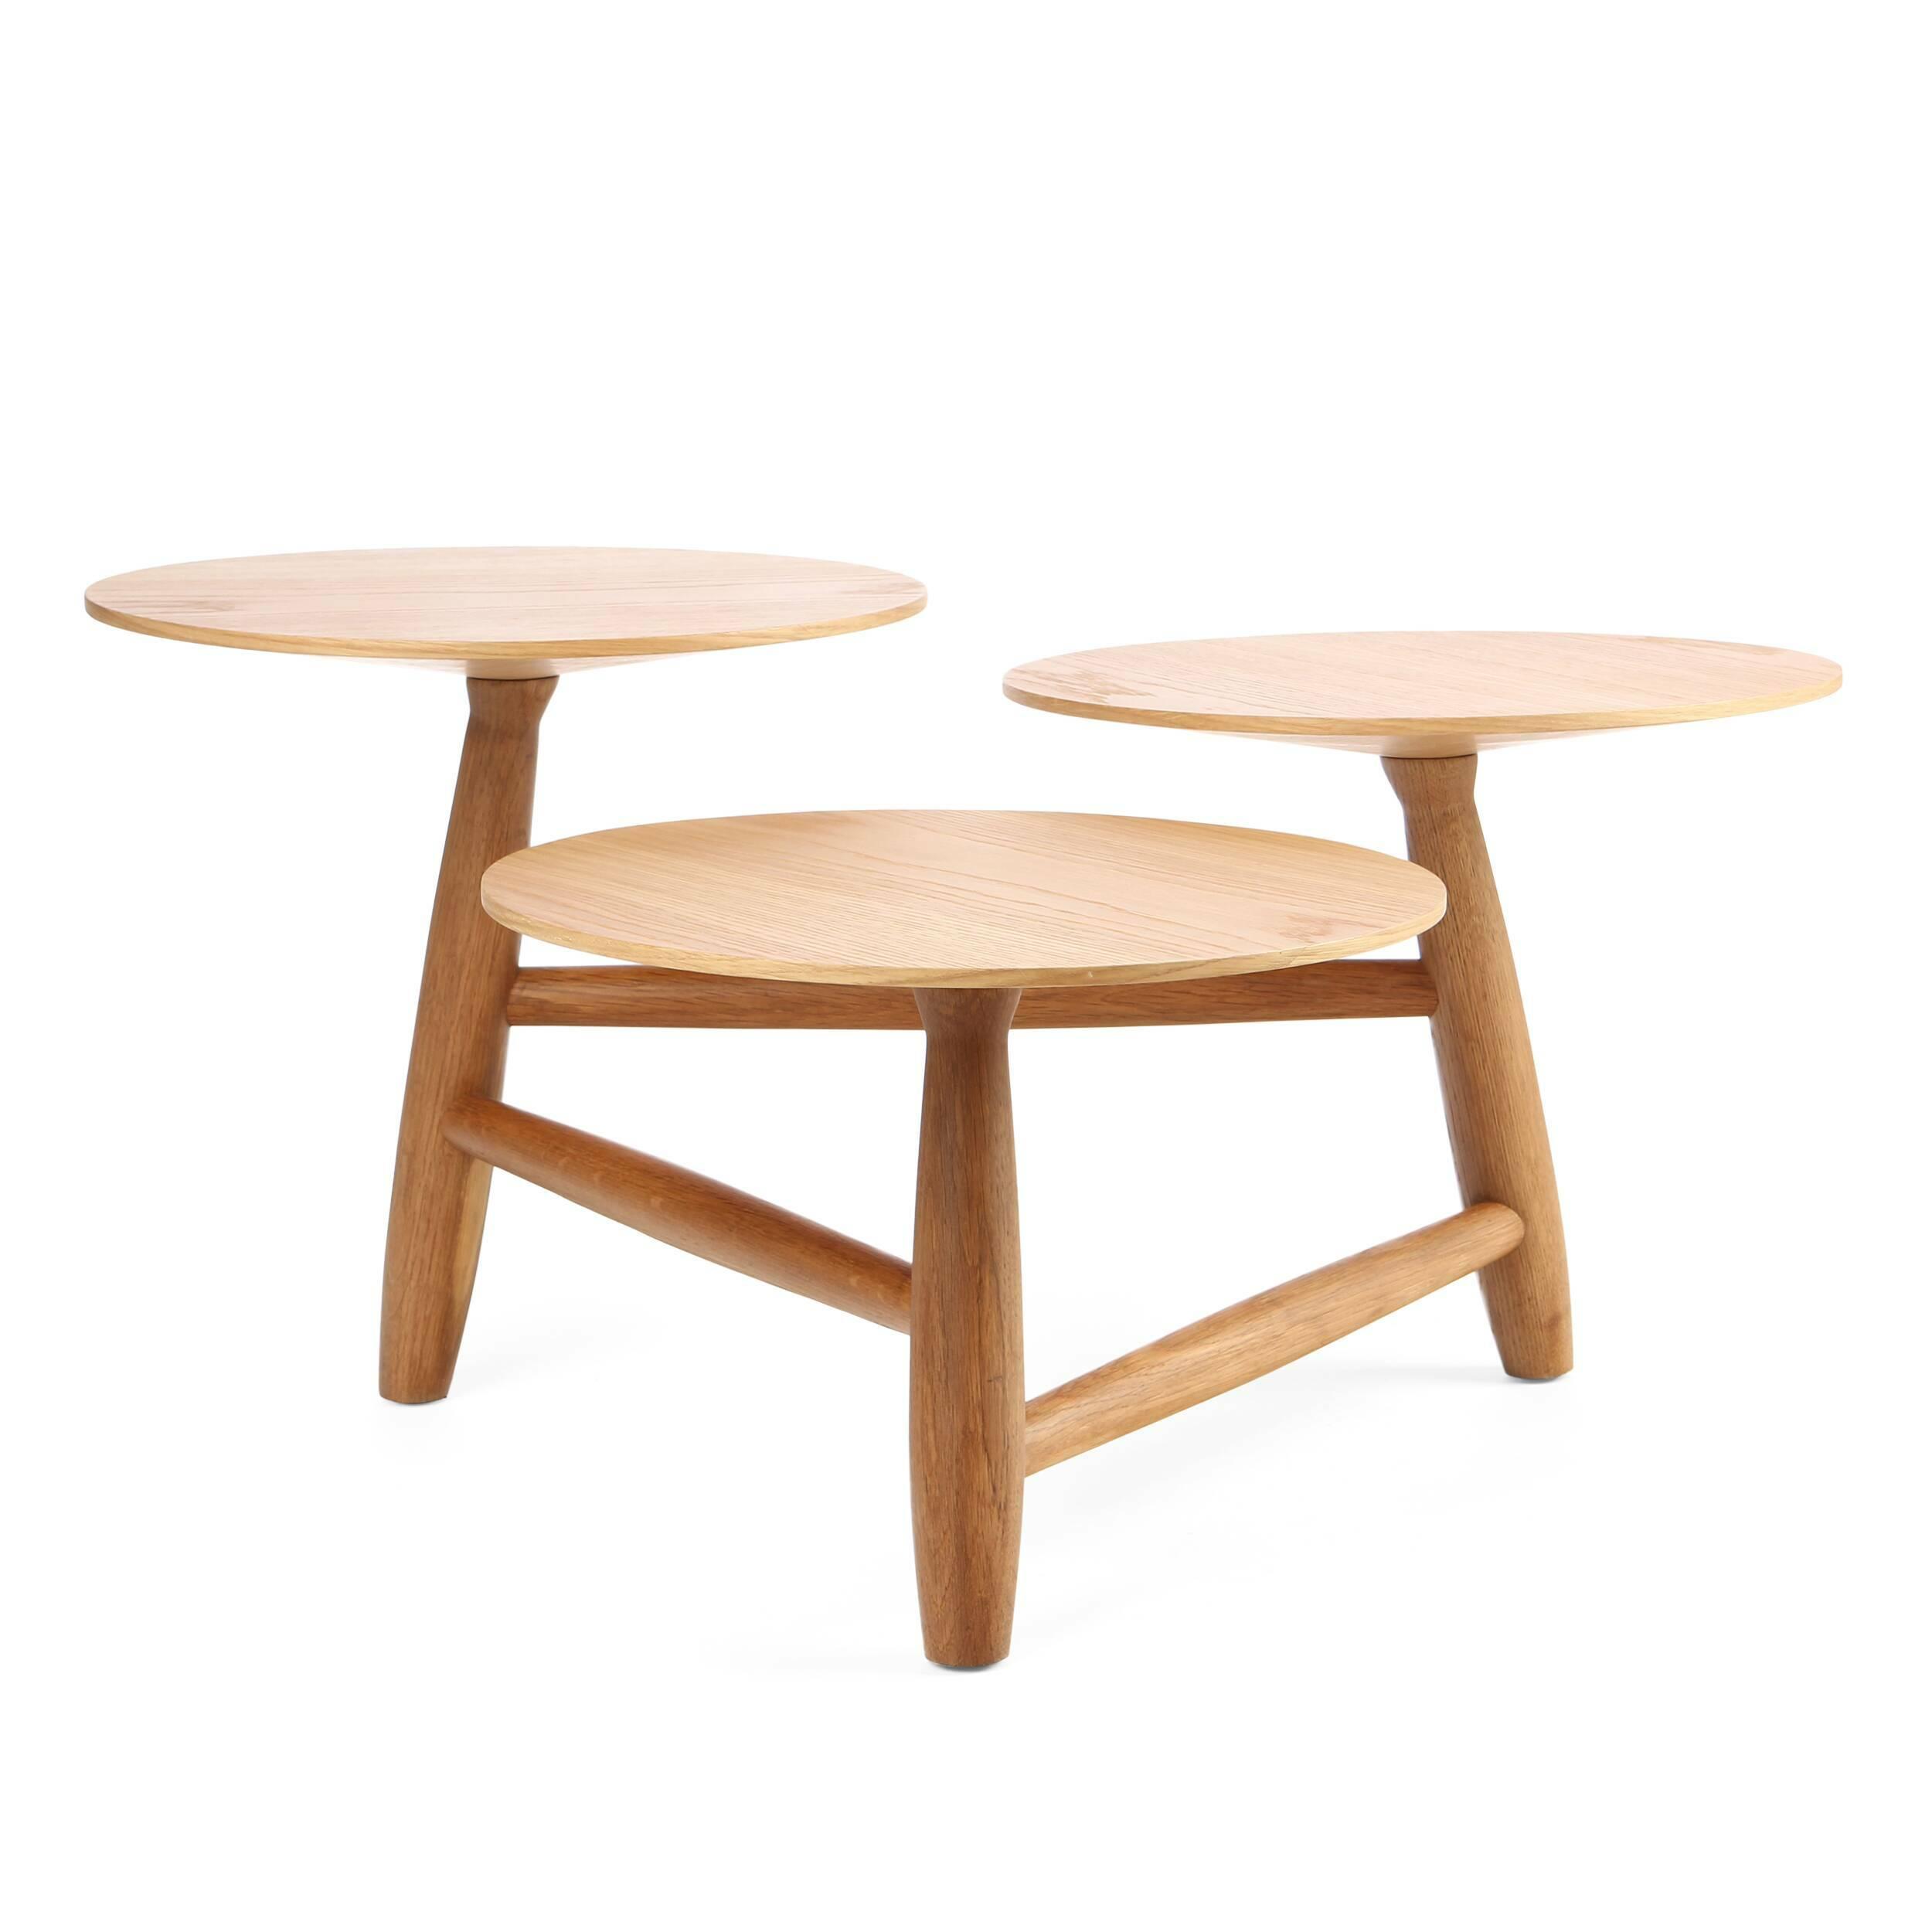 Кофейный стол Tripod высота 40 кофейный стол machine высота 40